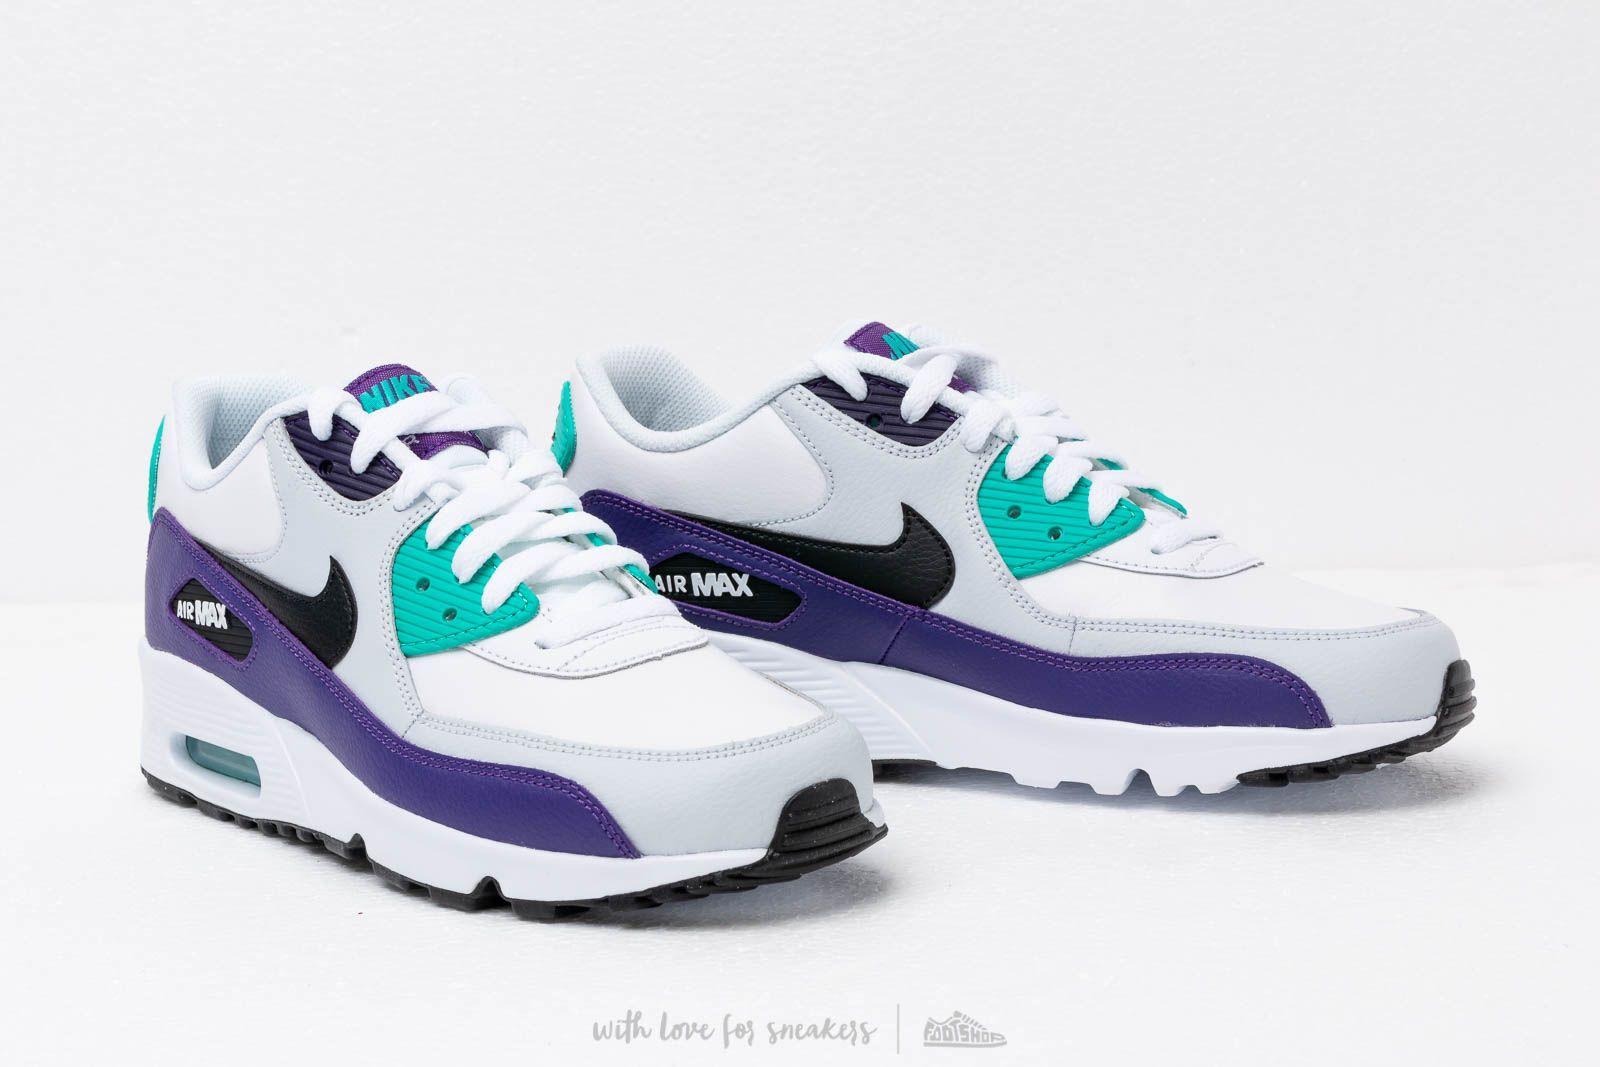 huge discount dea8e 57044 Nike Air Max 90 Ltr (gs) White  Black-hyper Jade-court Purple in ...